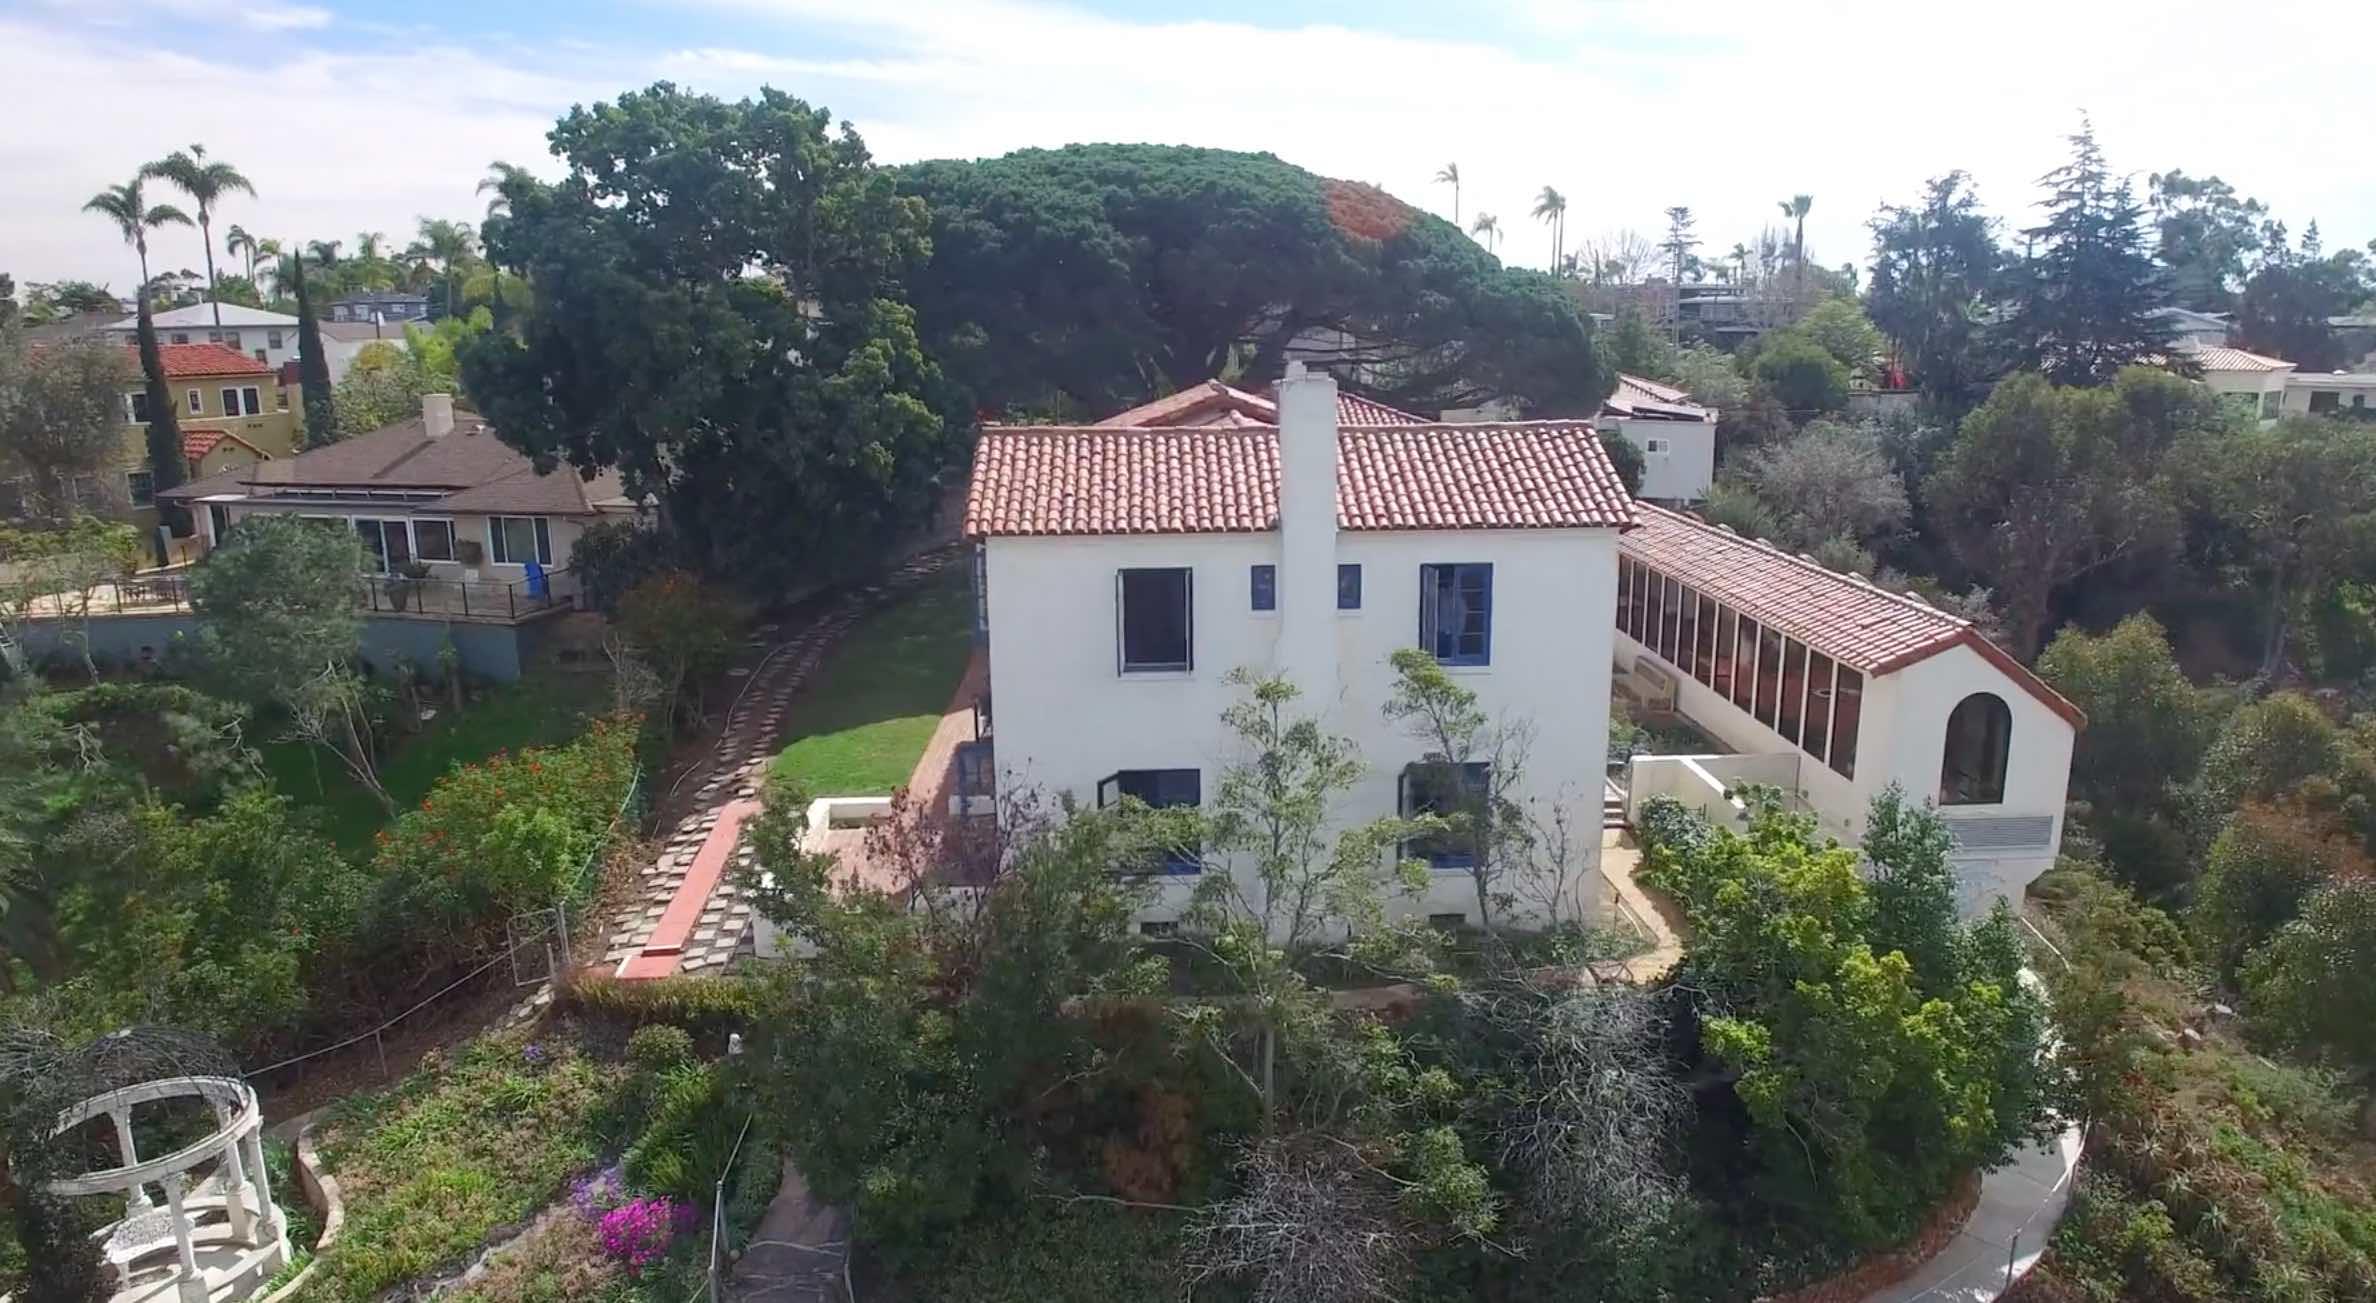 Villa-Hermosa-Aerial-9